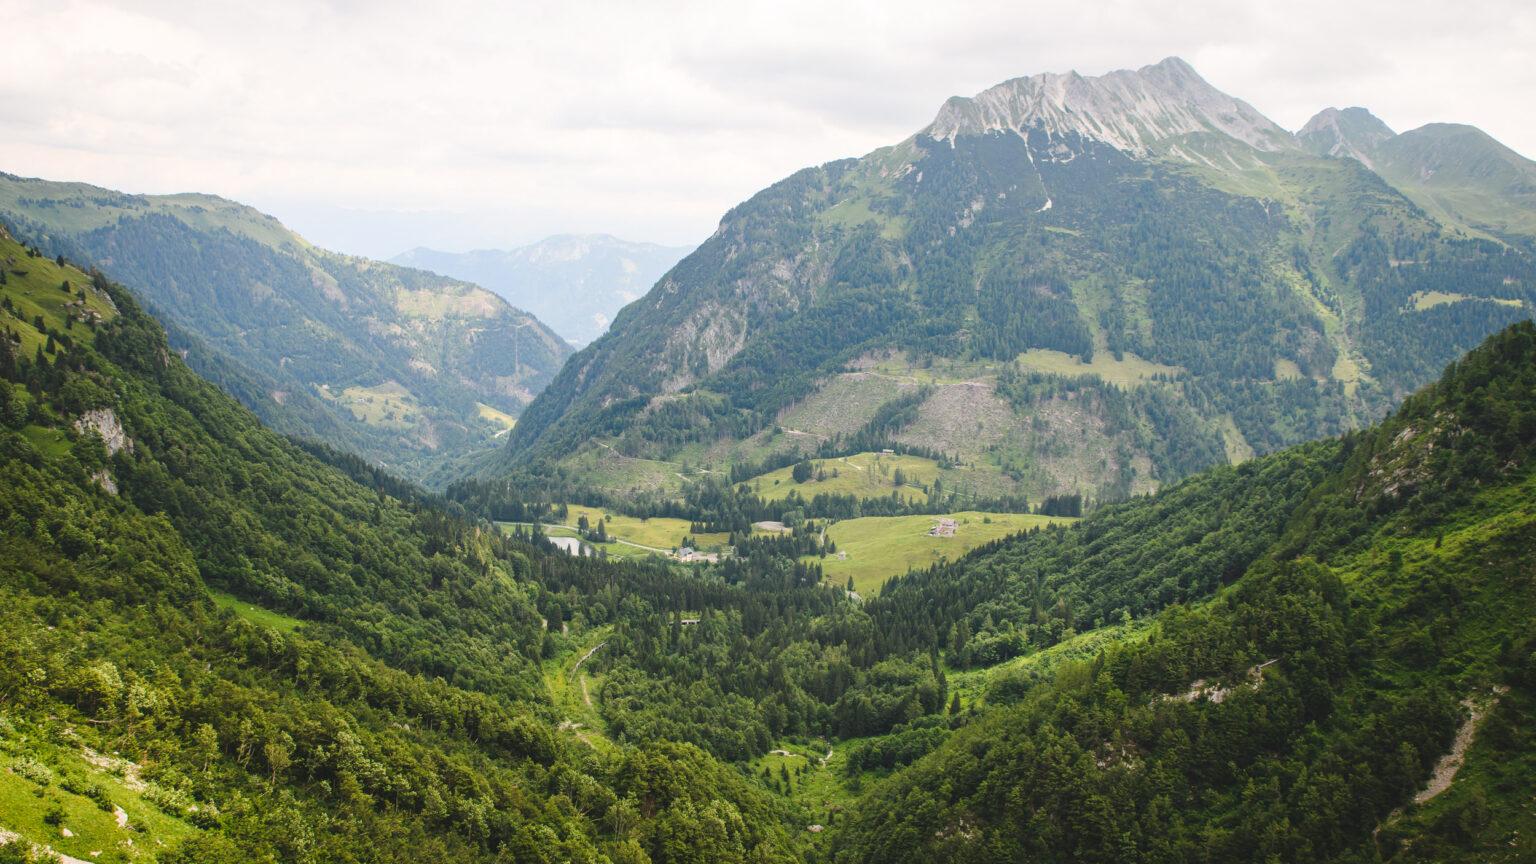 Widok na Alpy Karnickie